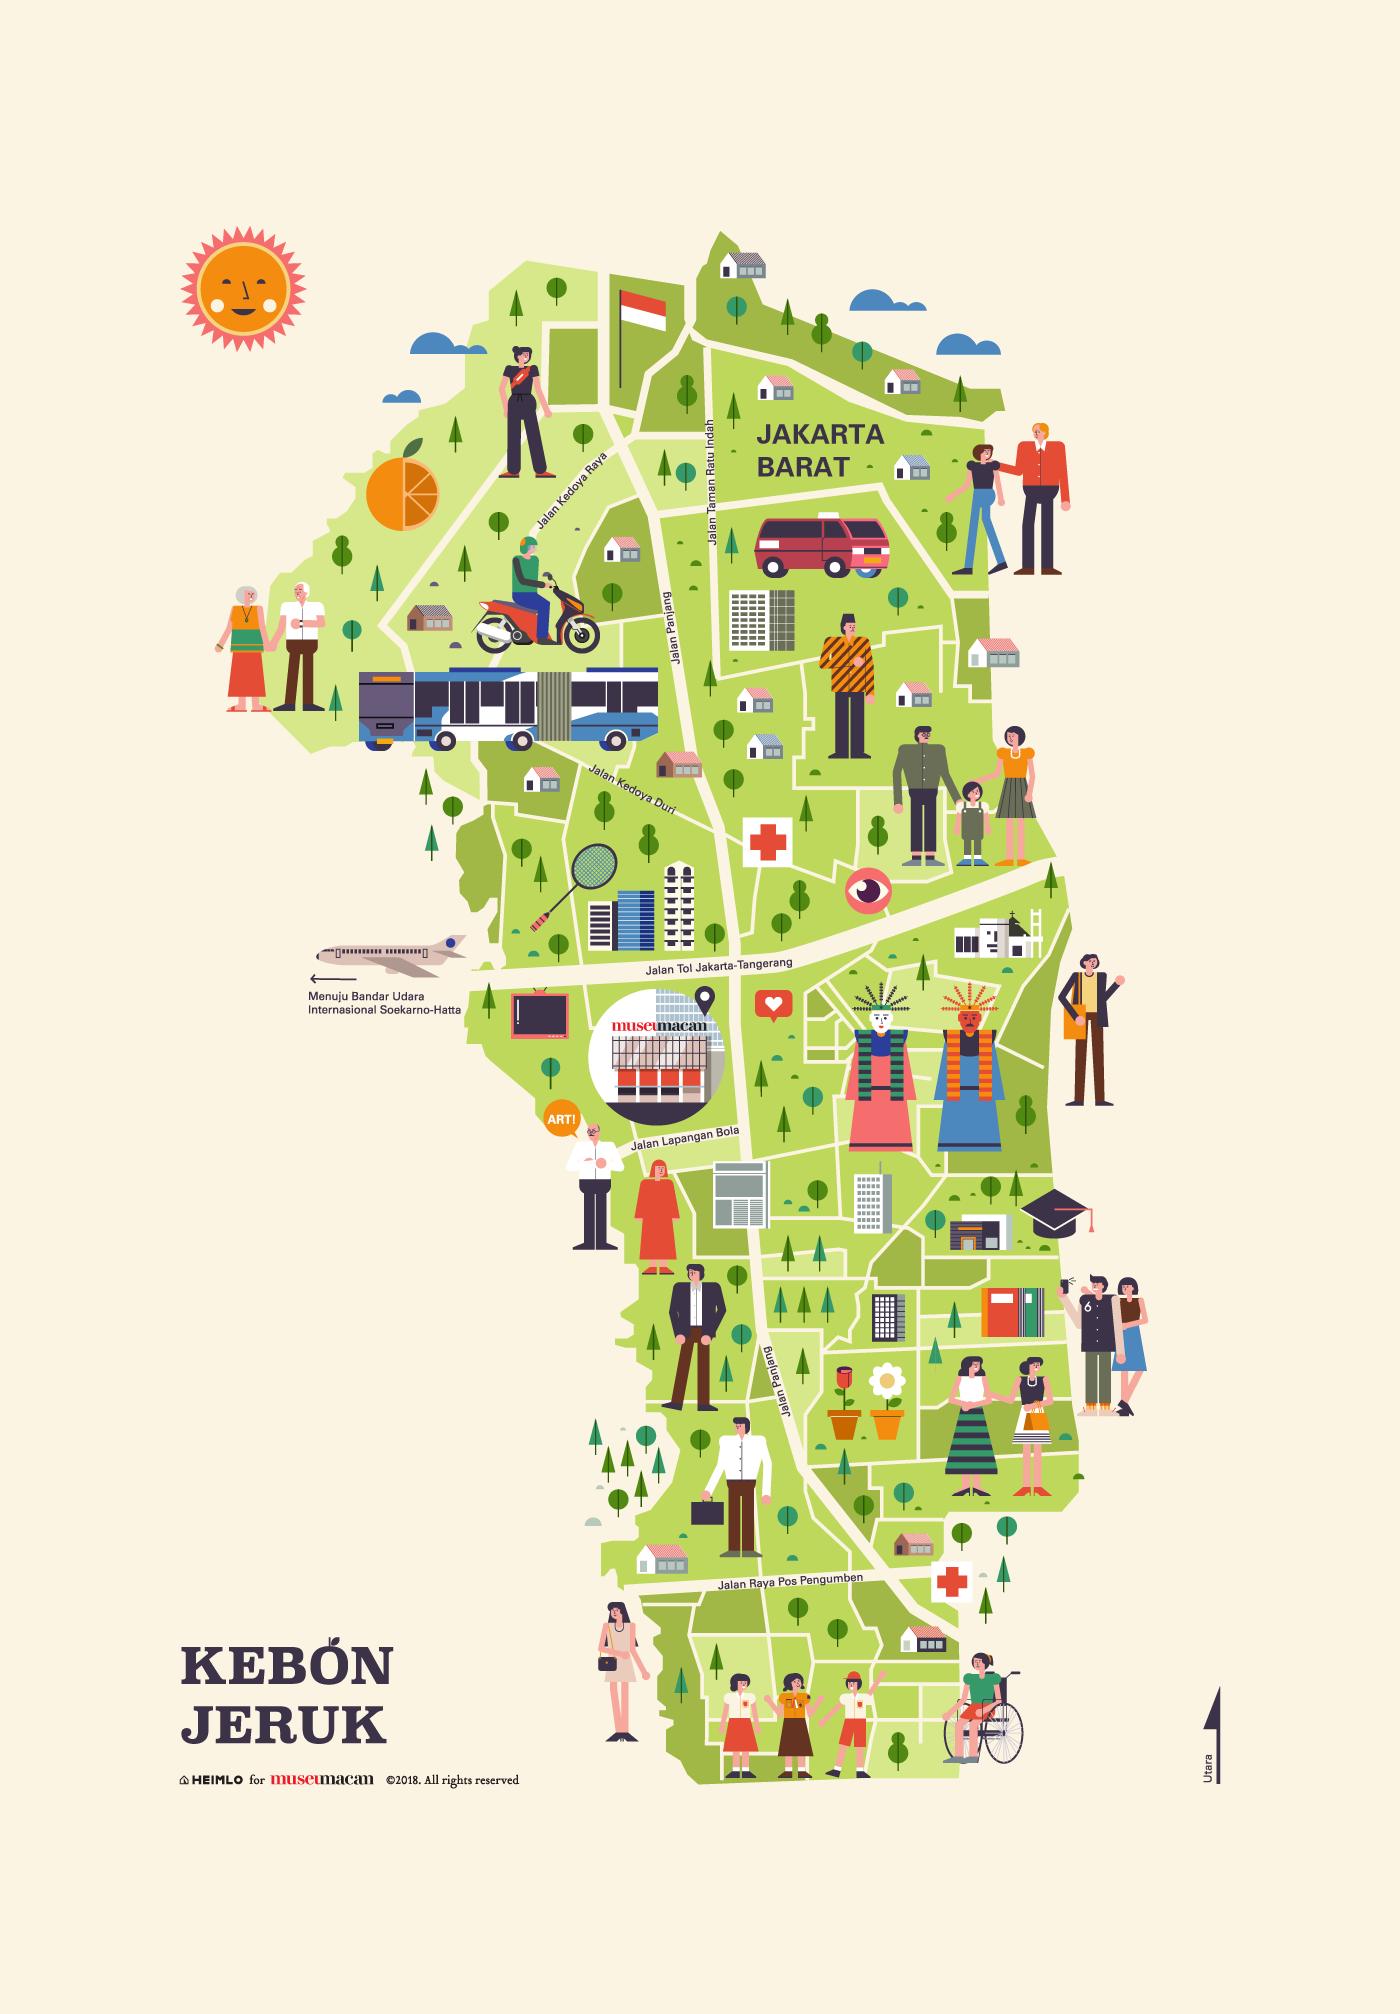 architecture heimlo indonesia infographic jakarta map merchandise museum people souvenir